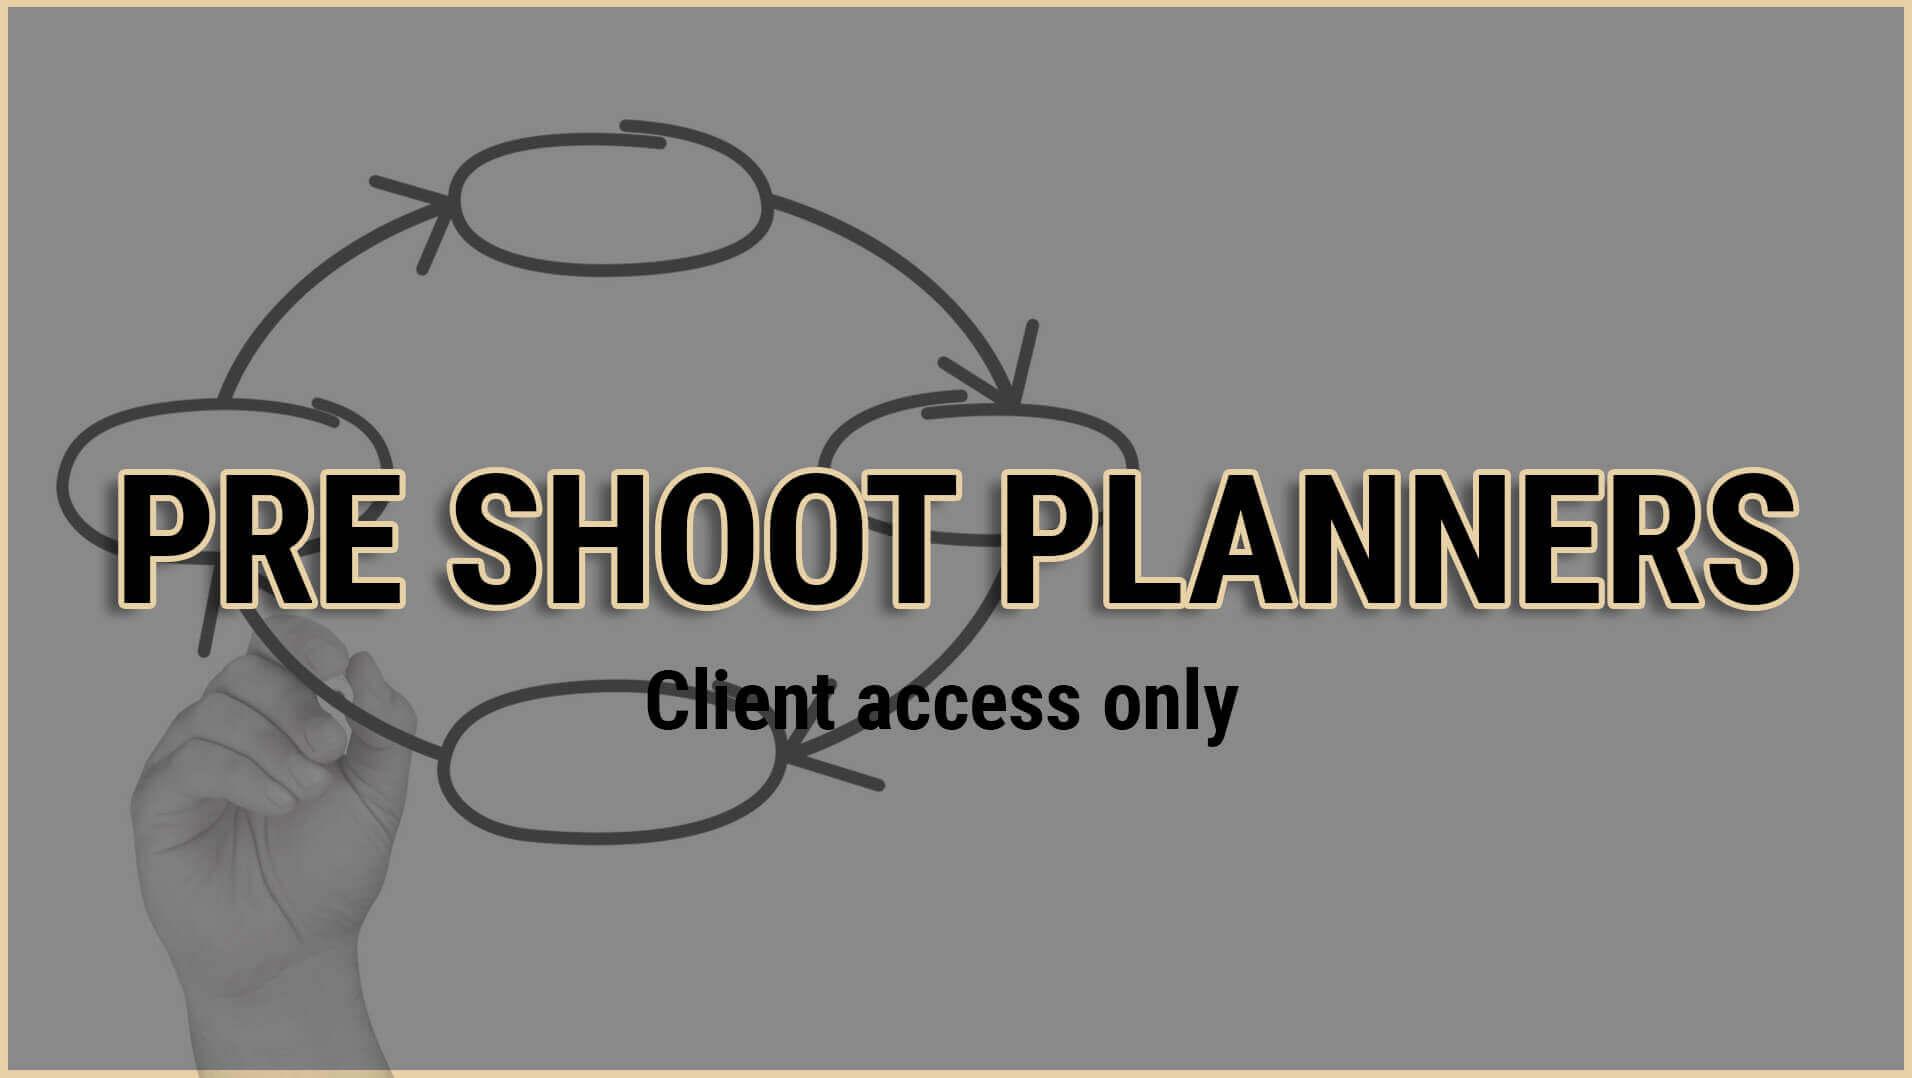 PRE SHOOT PLANNER GREY